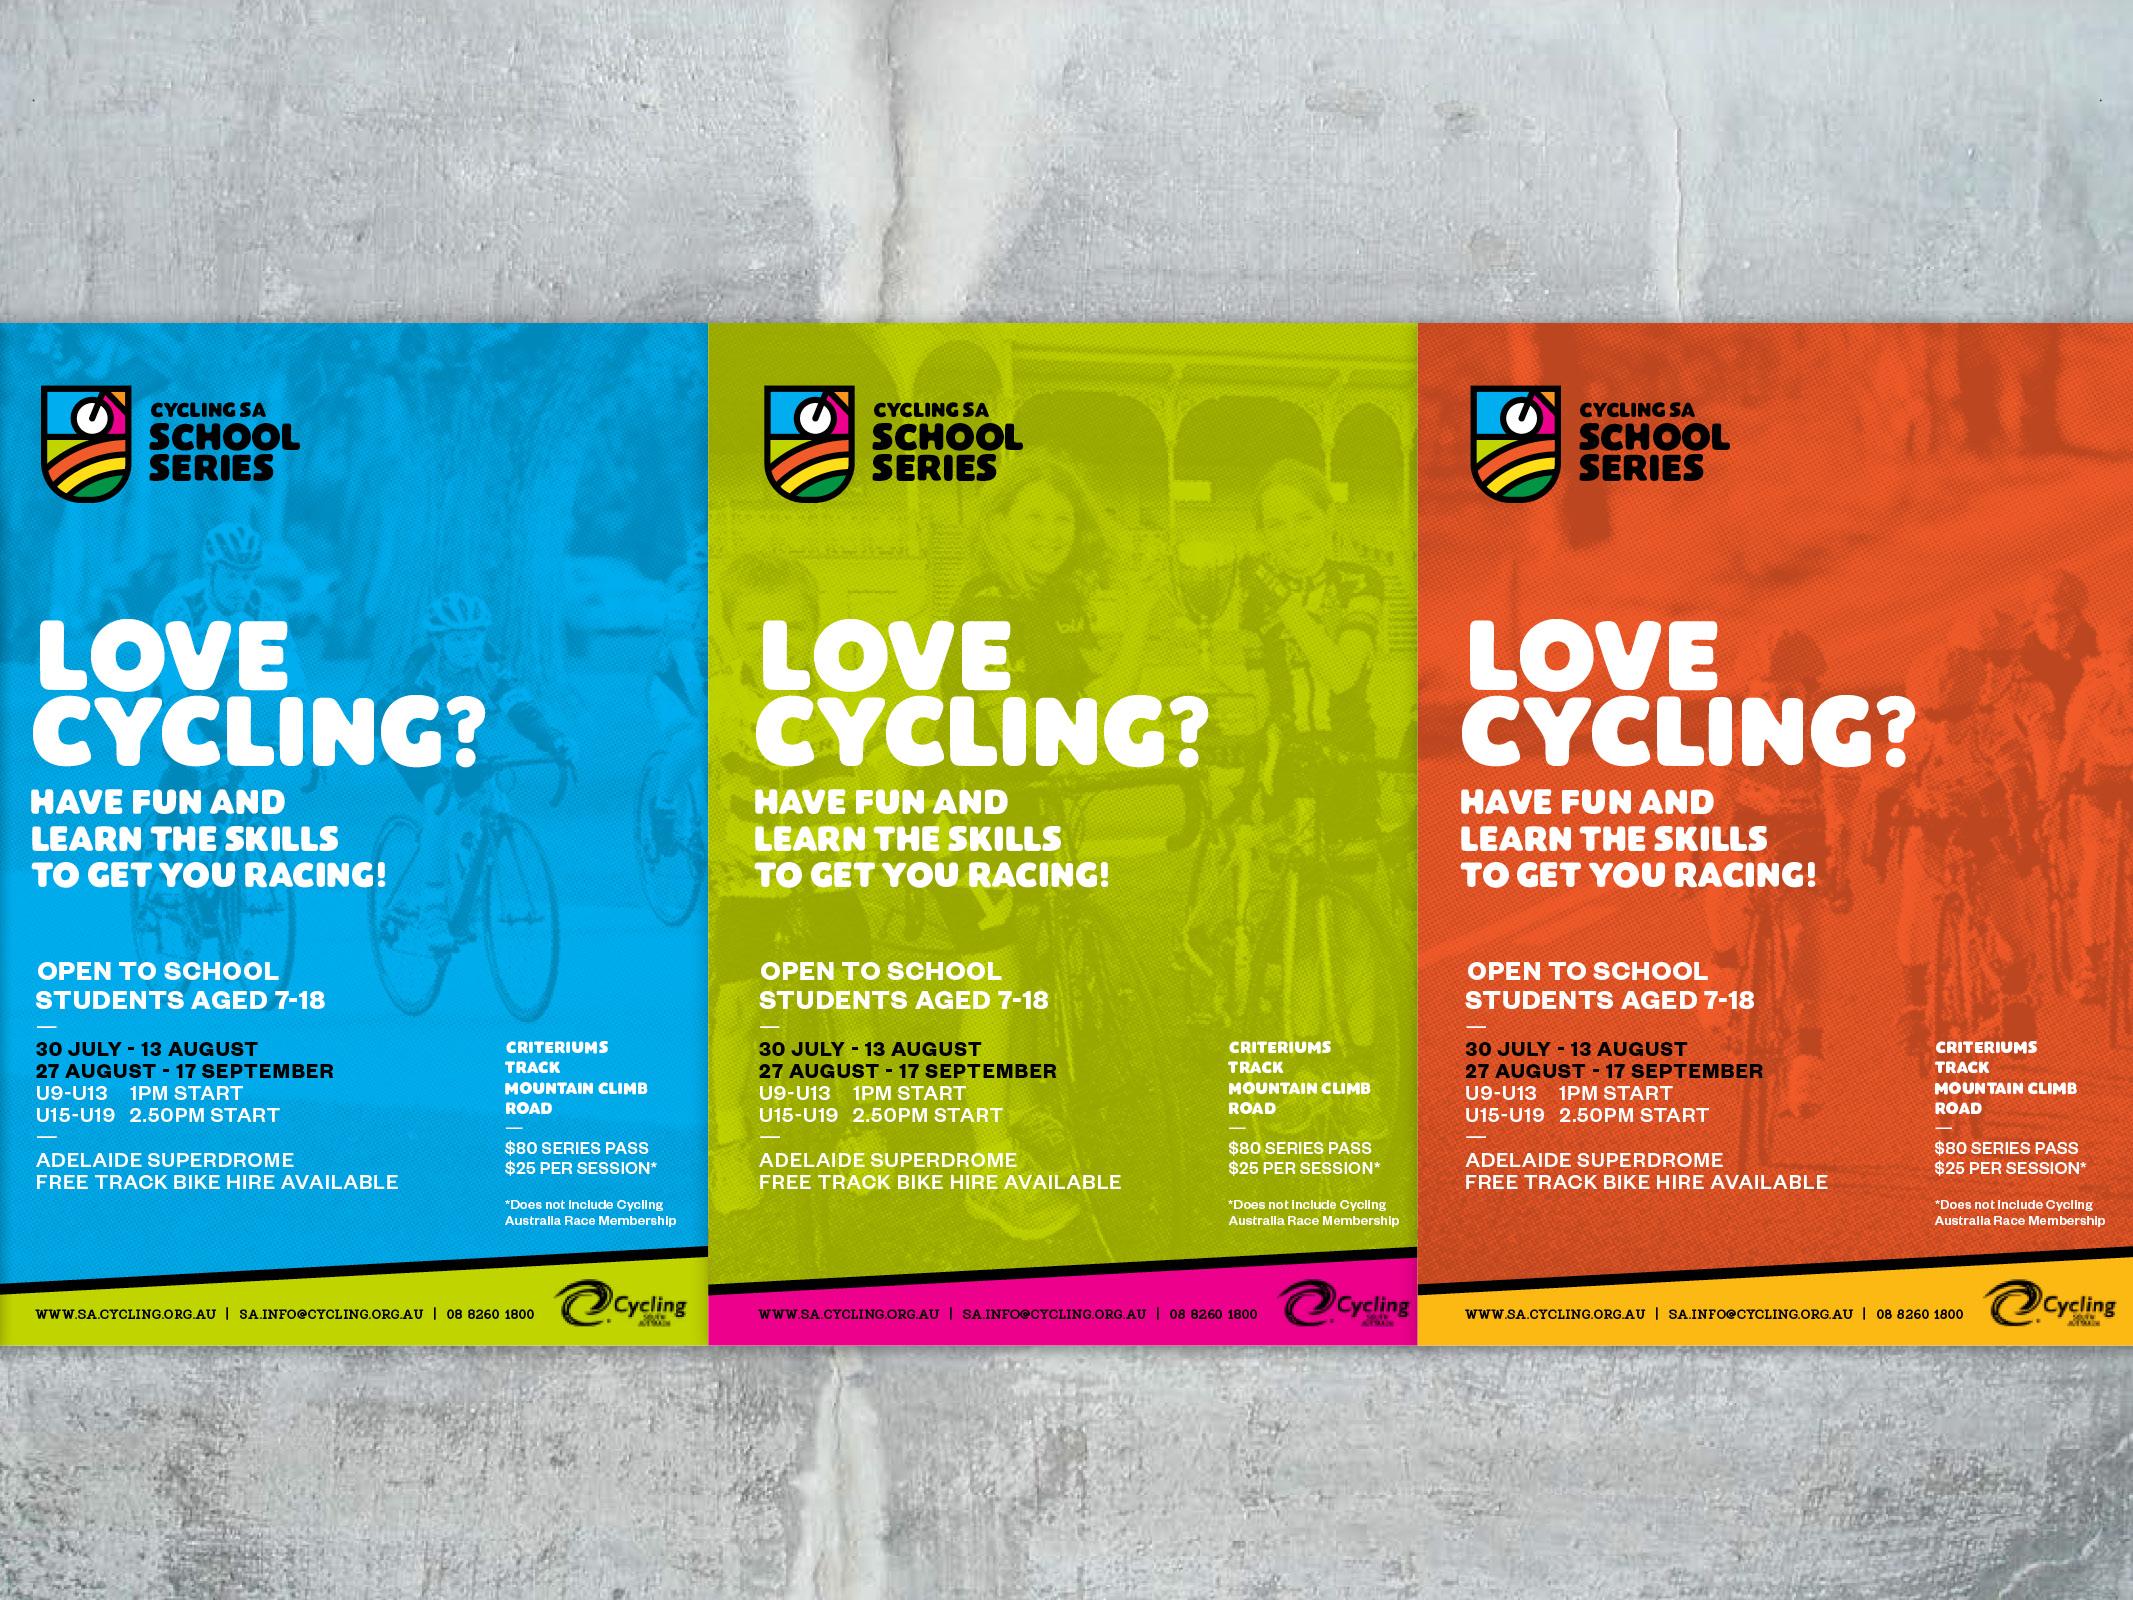 Cycling SA School Series Poster details